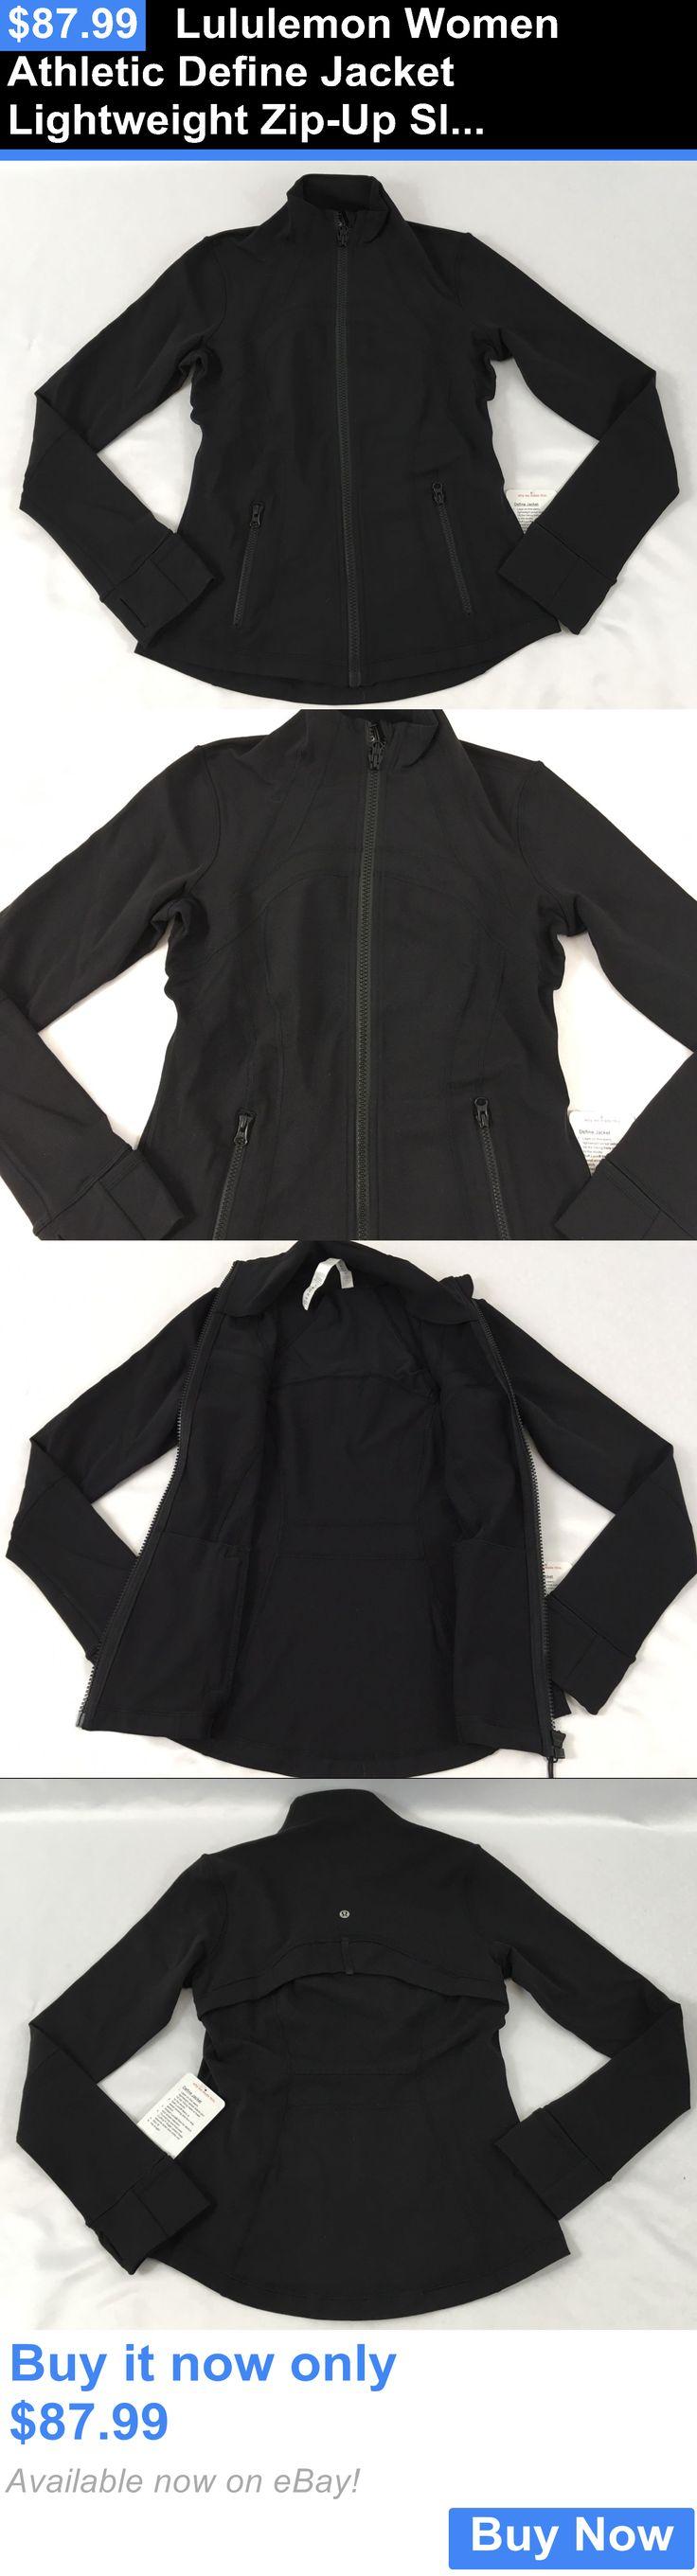 Women Athletics: Lululemon Women Athletic Define Jacket Lightweight Zip-Up Slim Fit Black Size 12 BUY IT NOW ONLY: $87.99